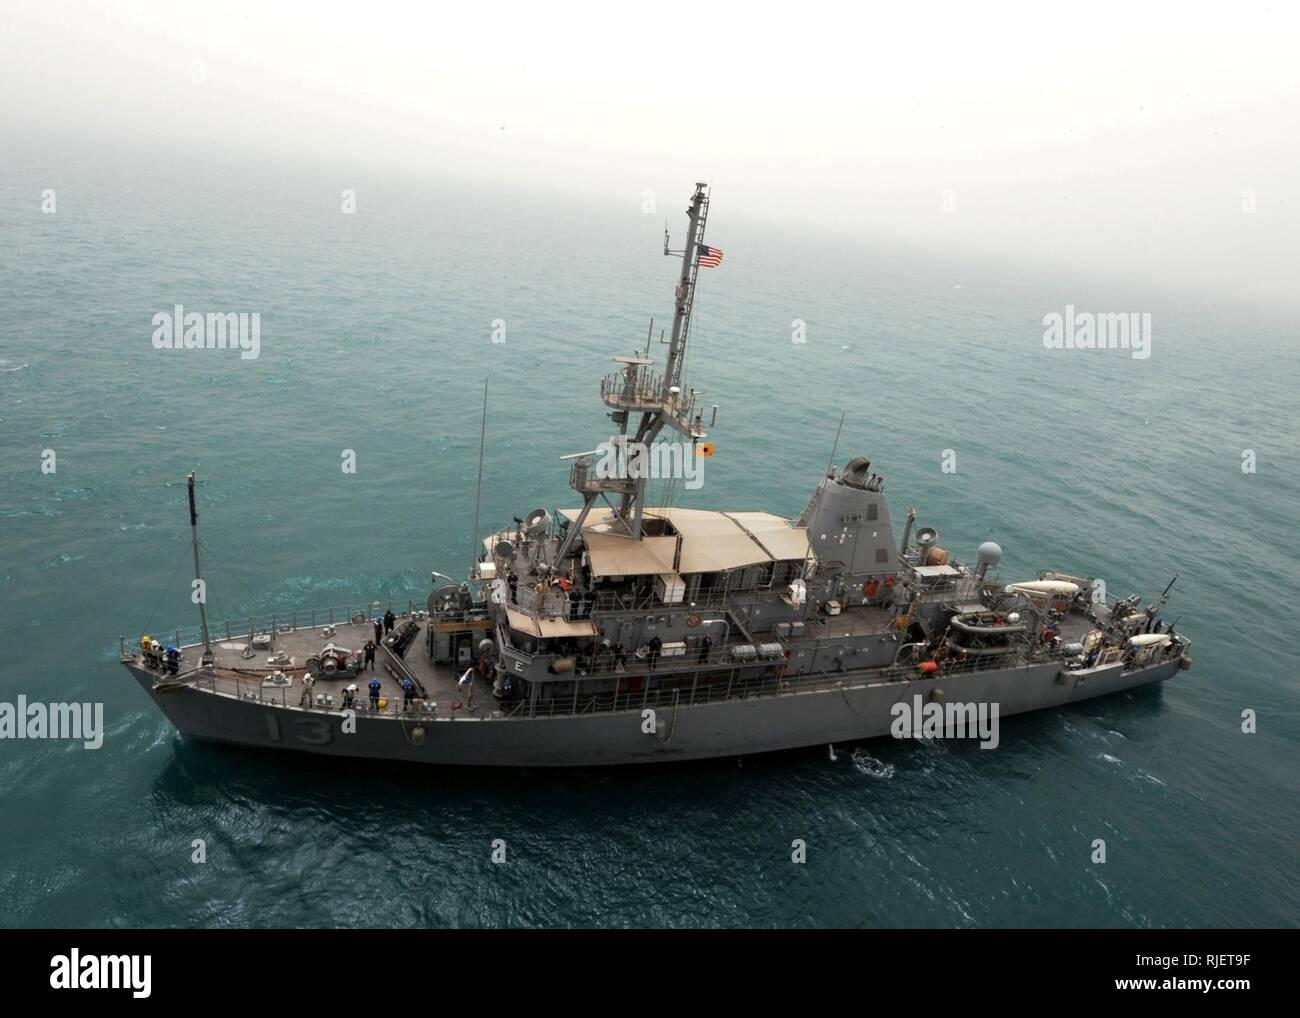 ARABIAN GULF (April 23, 2010) The Avenger-class mine countermeasures ship USS Dextrous (MCM 13) conducts drills in the Arabian Gulf. - Stock Image